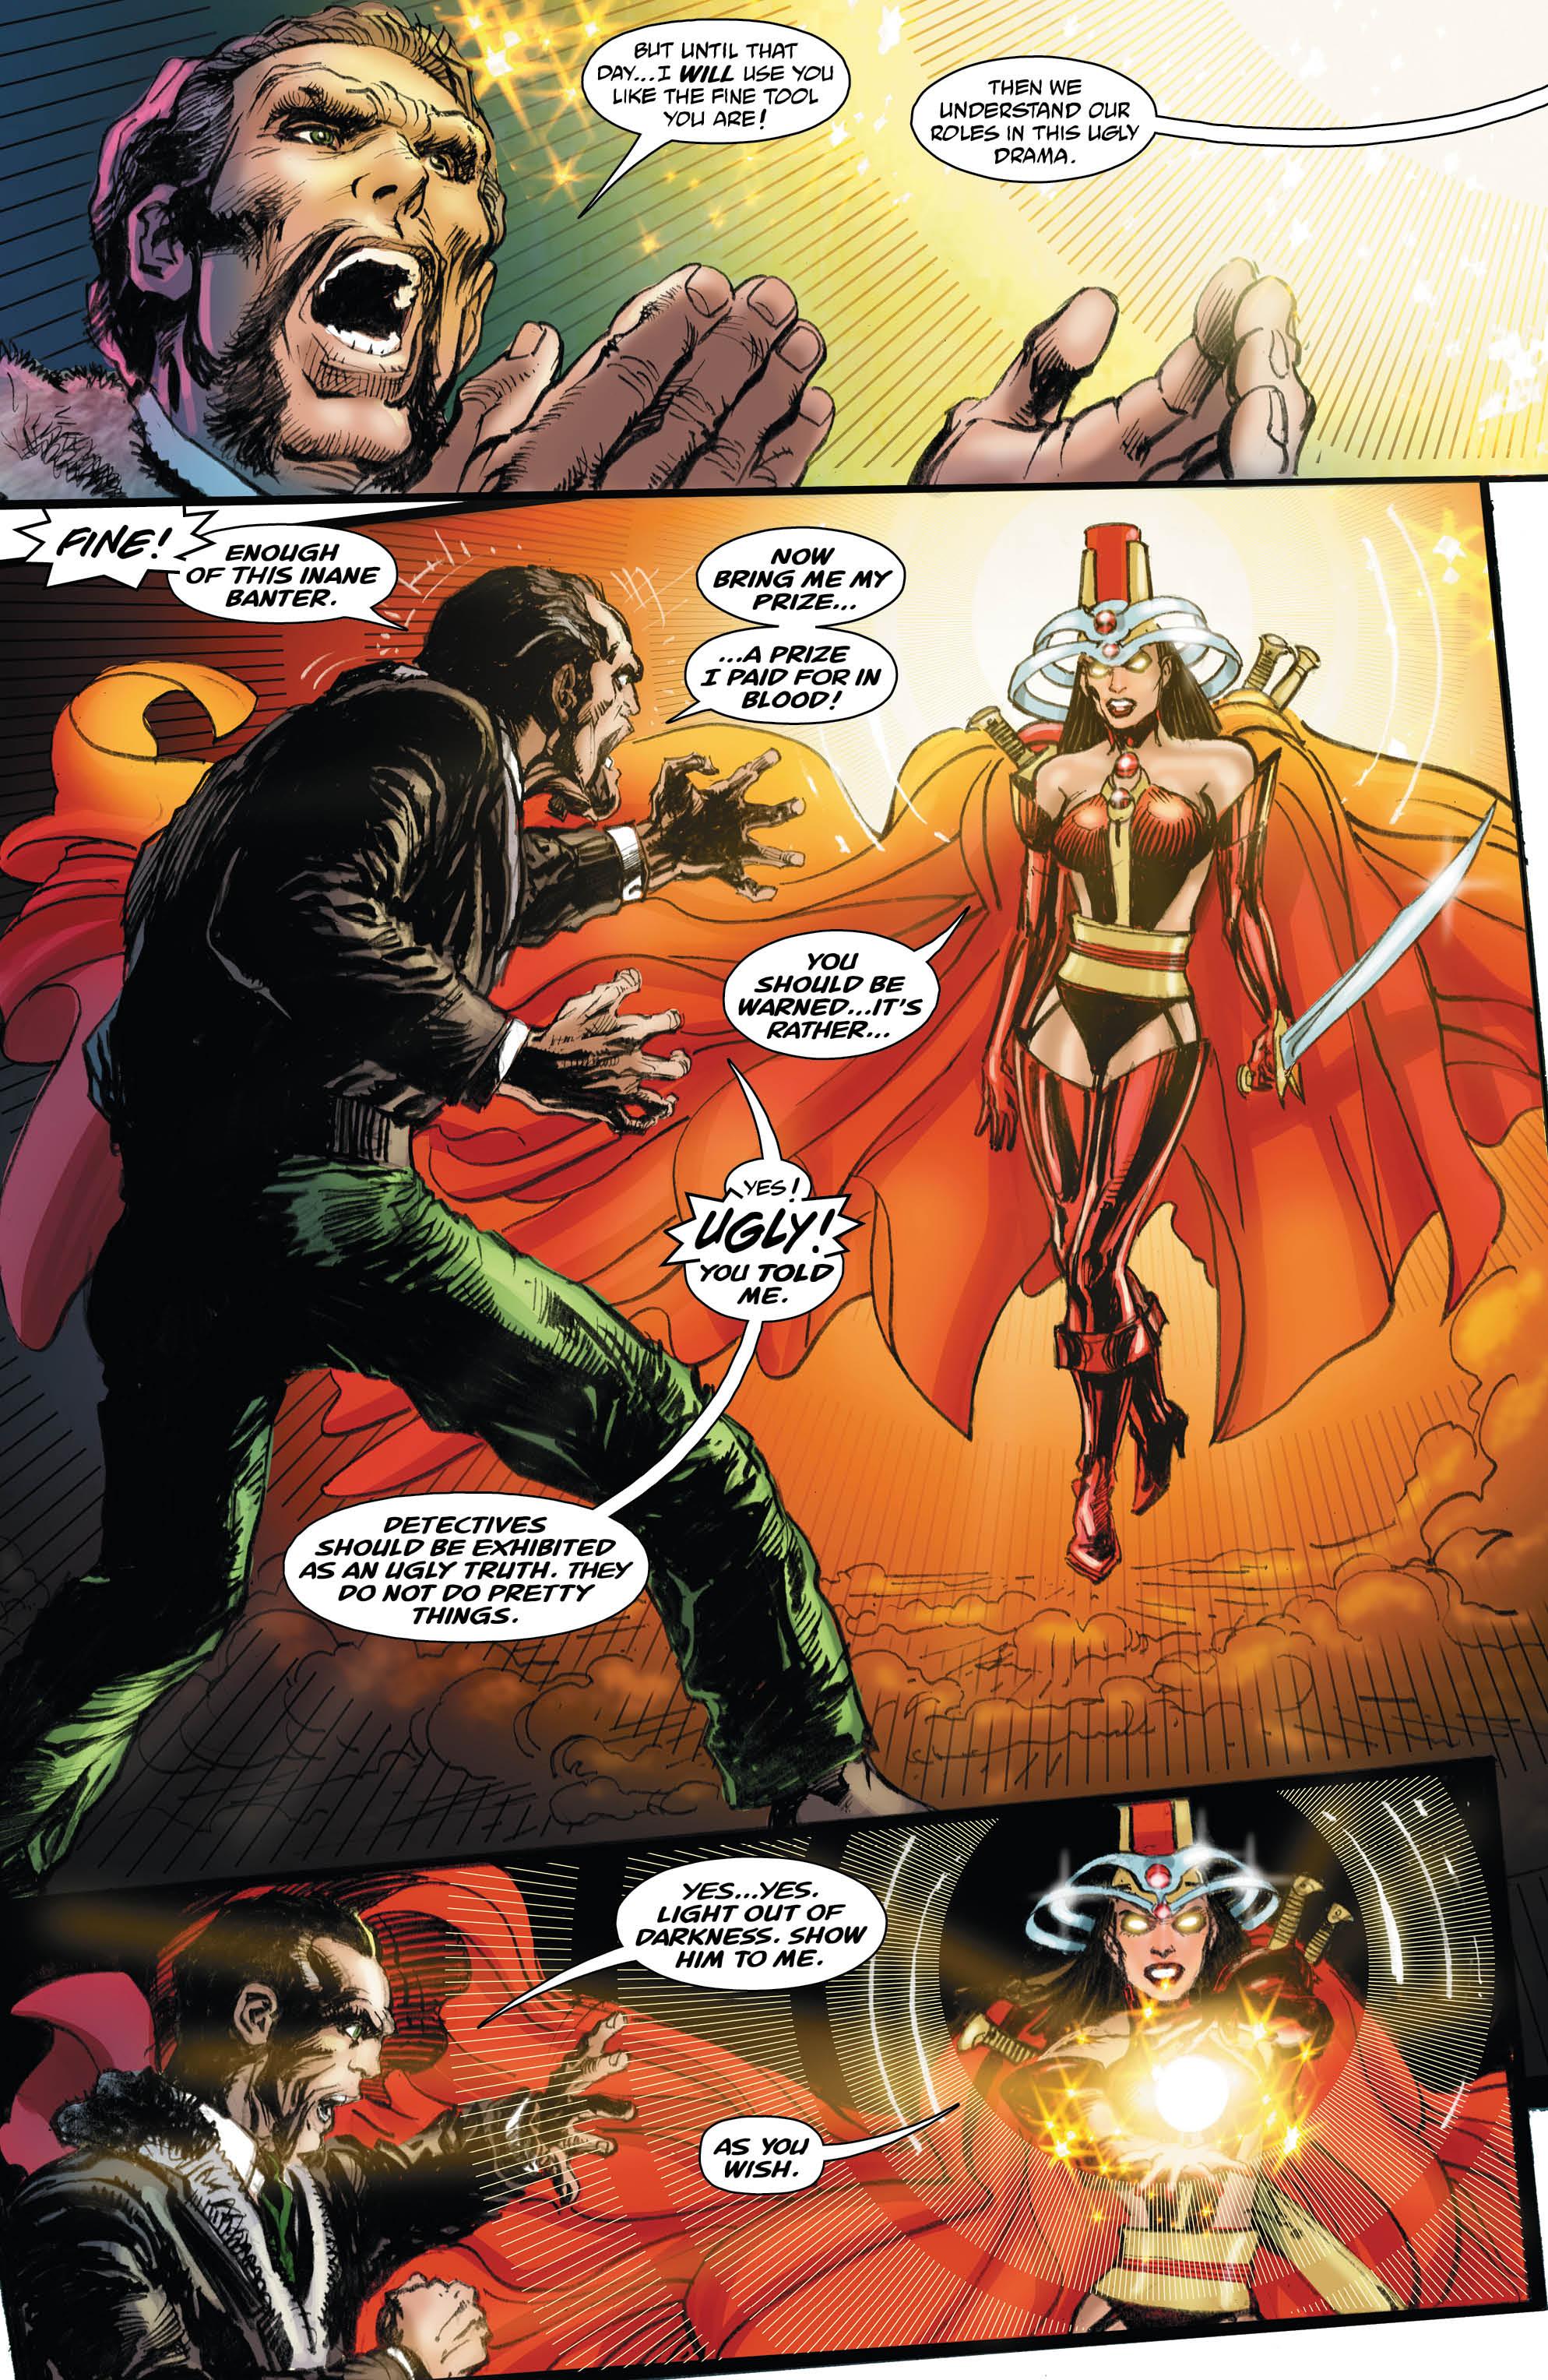 Batman vs. Ra's al Ghul 3